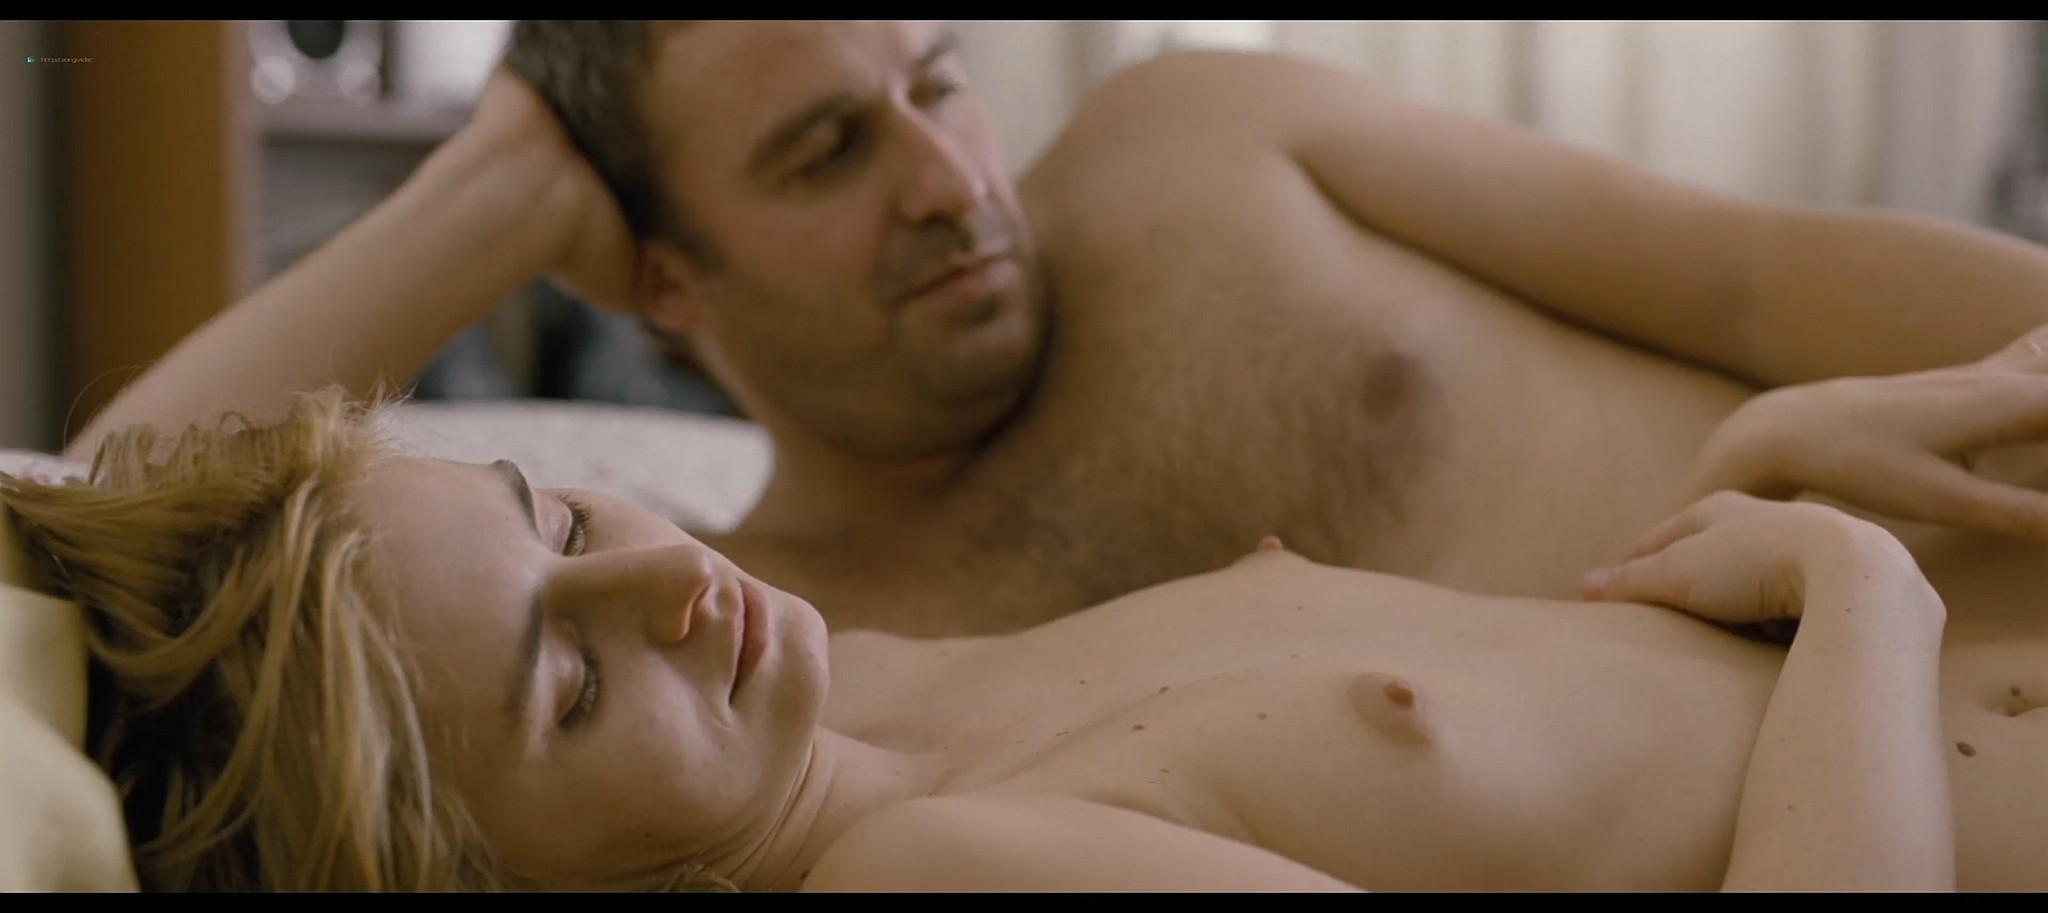 Maria Popistasu nude bush Tuesday After Christmas RO 2010 1080p Web 5